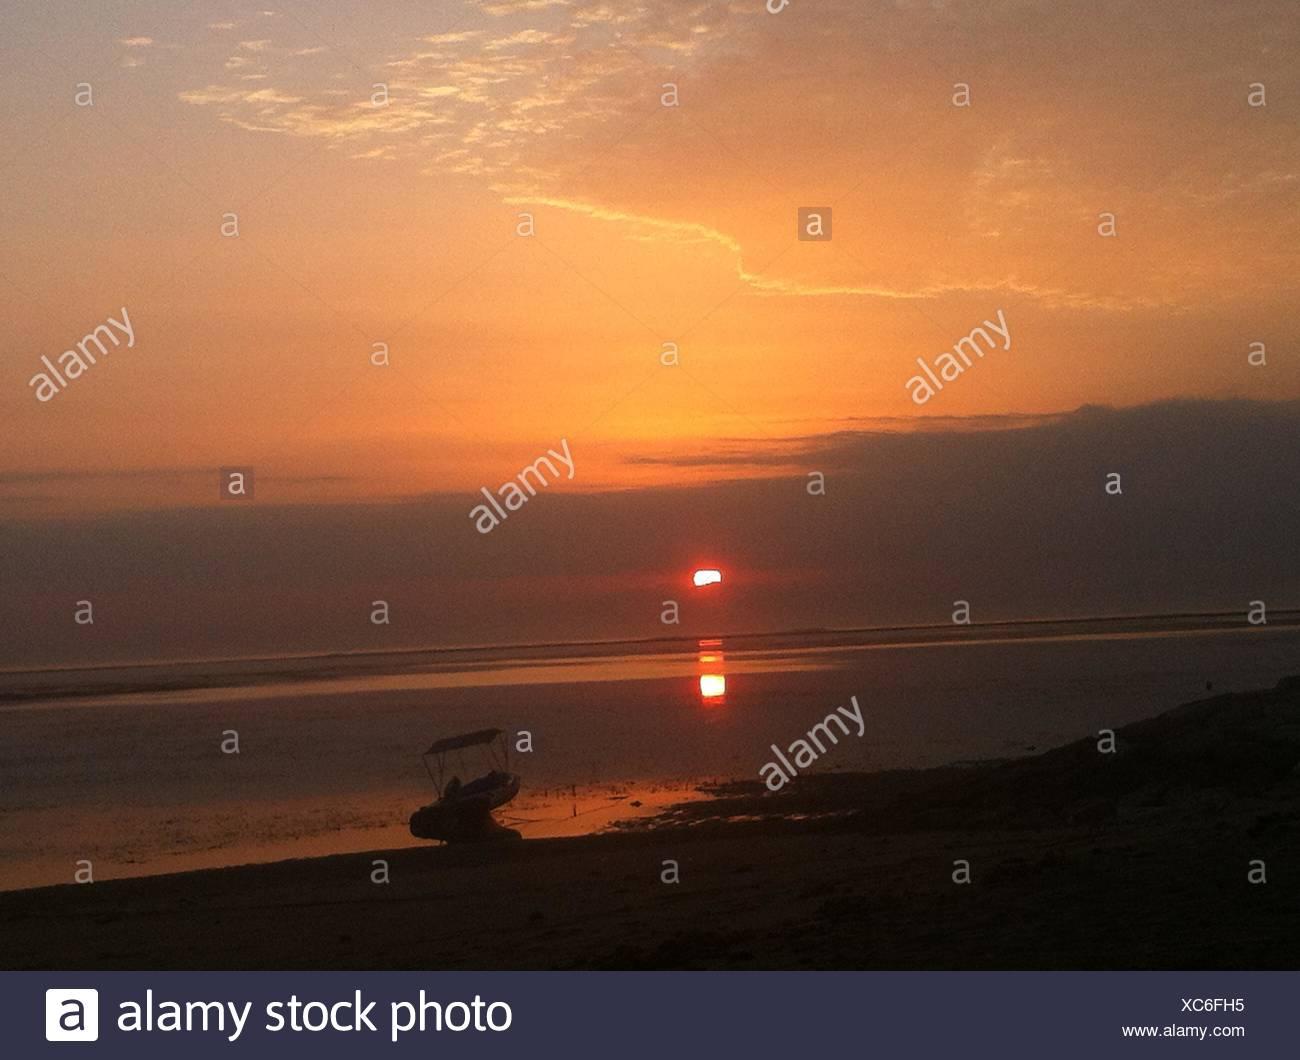 Sunrise on Meta Sari. Sunrise on Meta Sari beach, Sanur - Stock Image